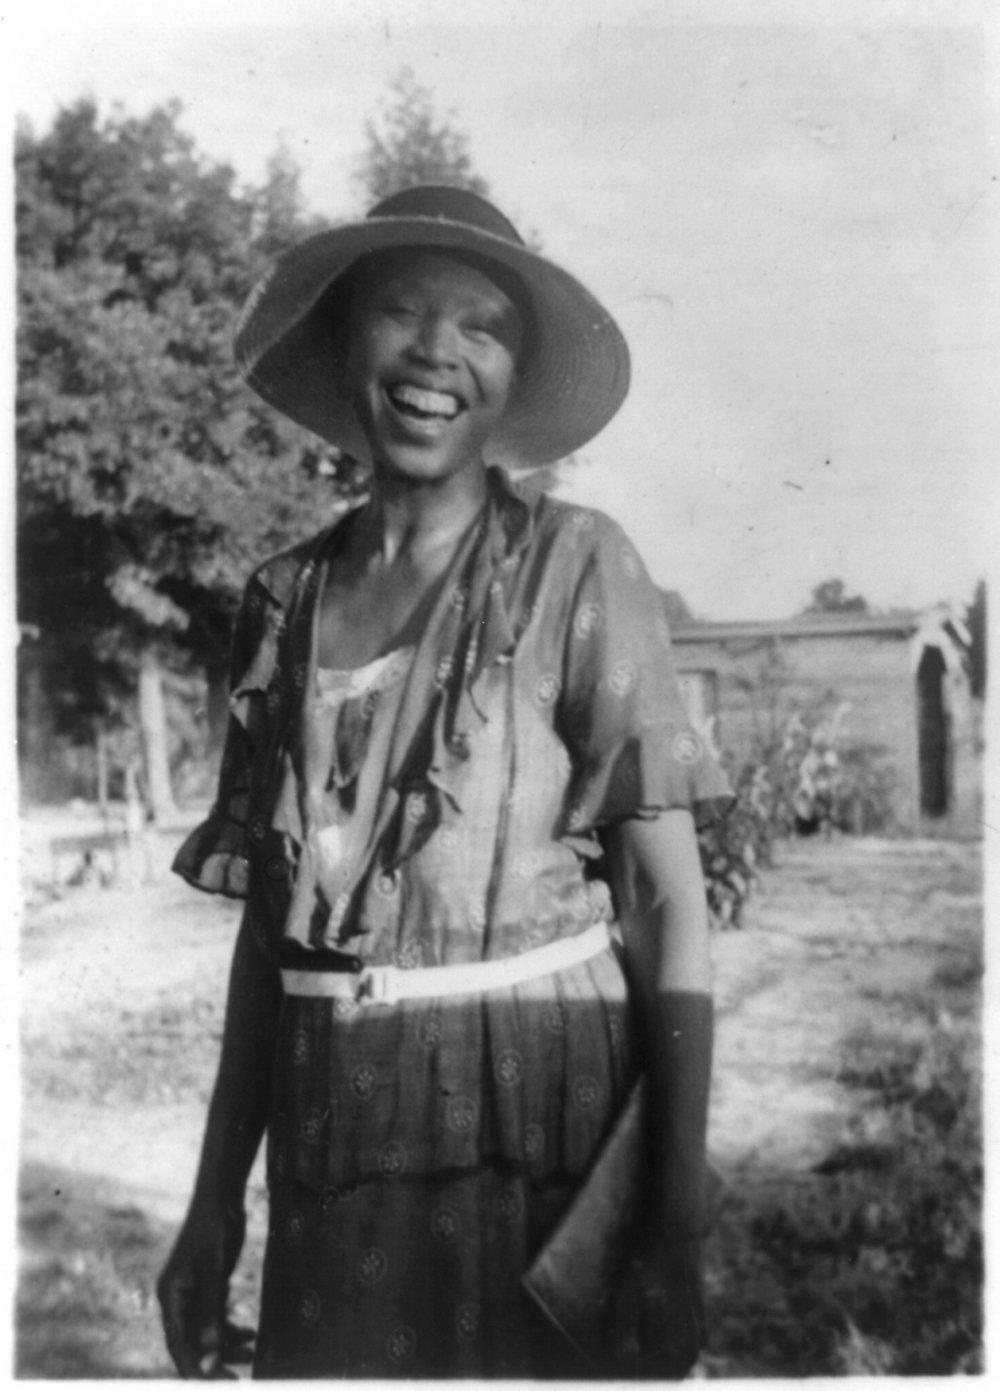 Zora Neale Hurston, Courtesy of Library of Congress